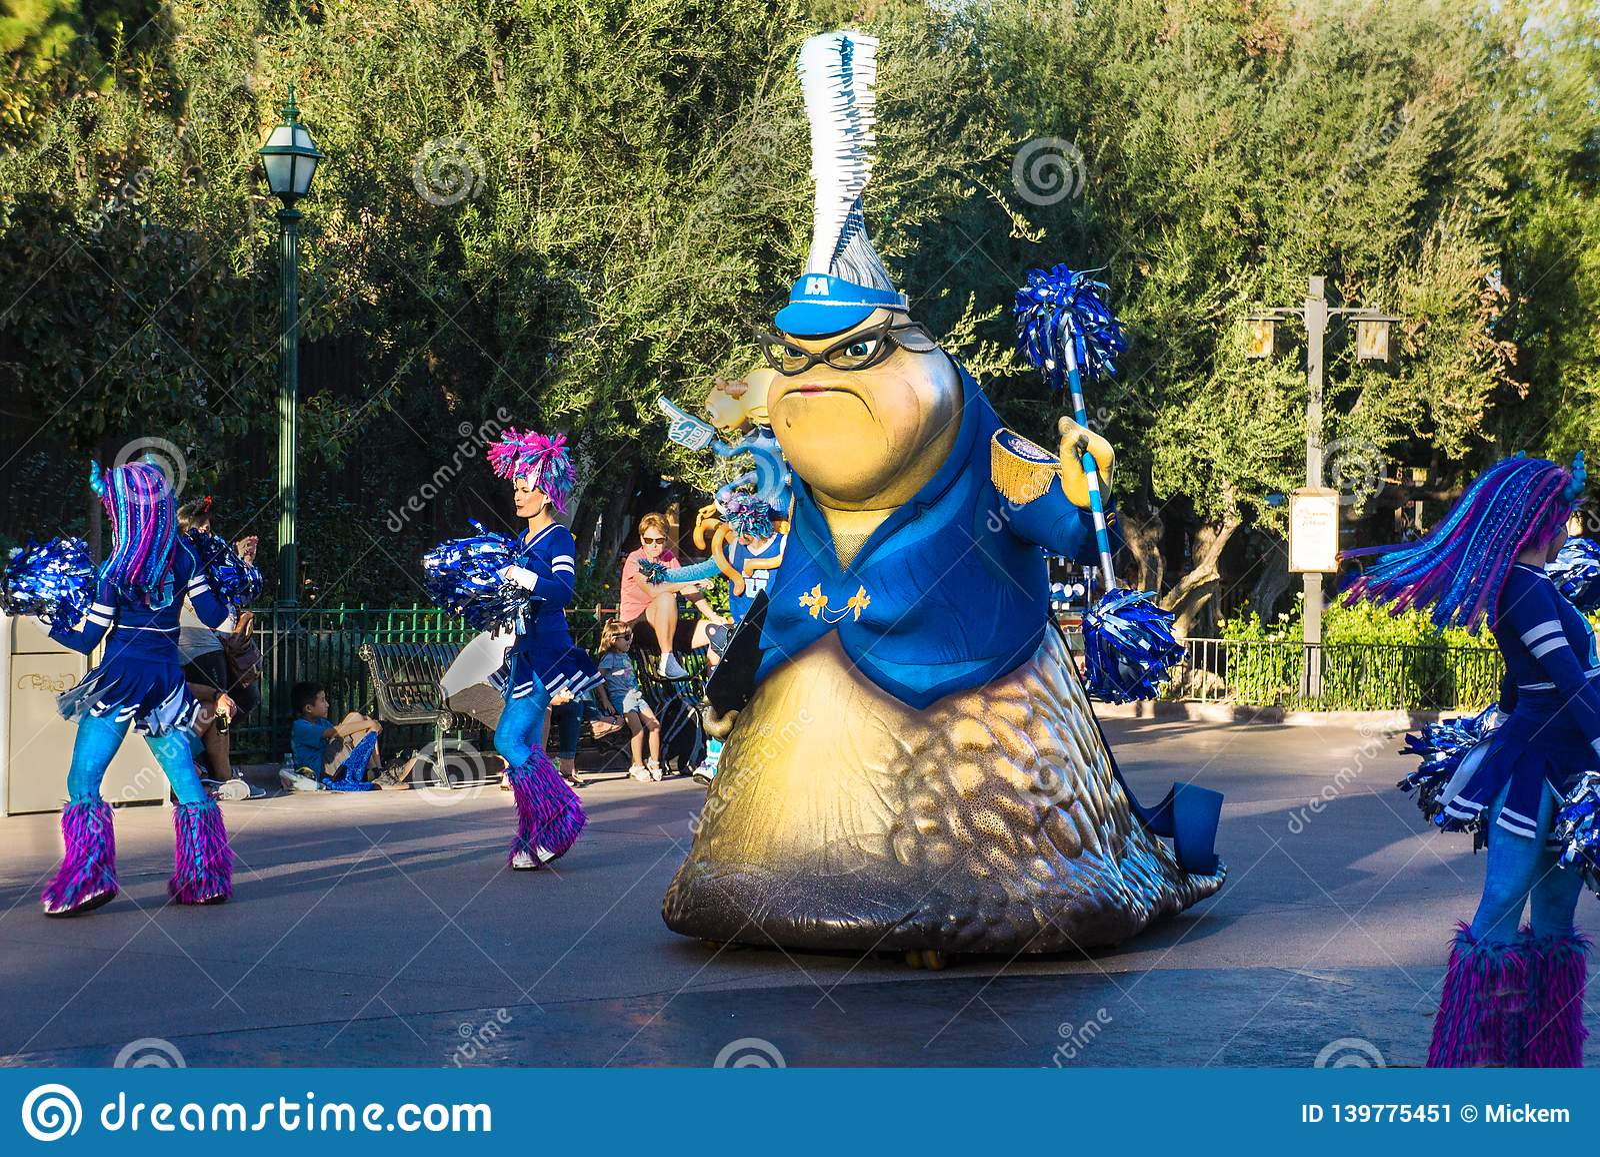 Disney Pixar Parade Monsters Inc Editorial Photo - Image of